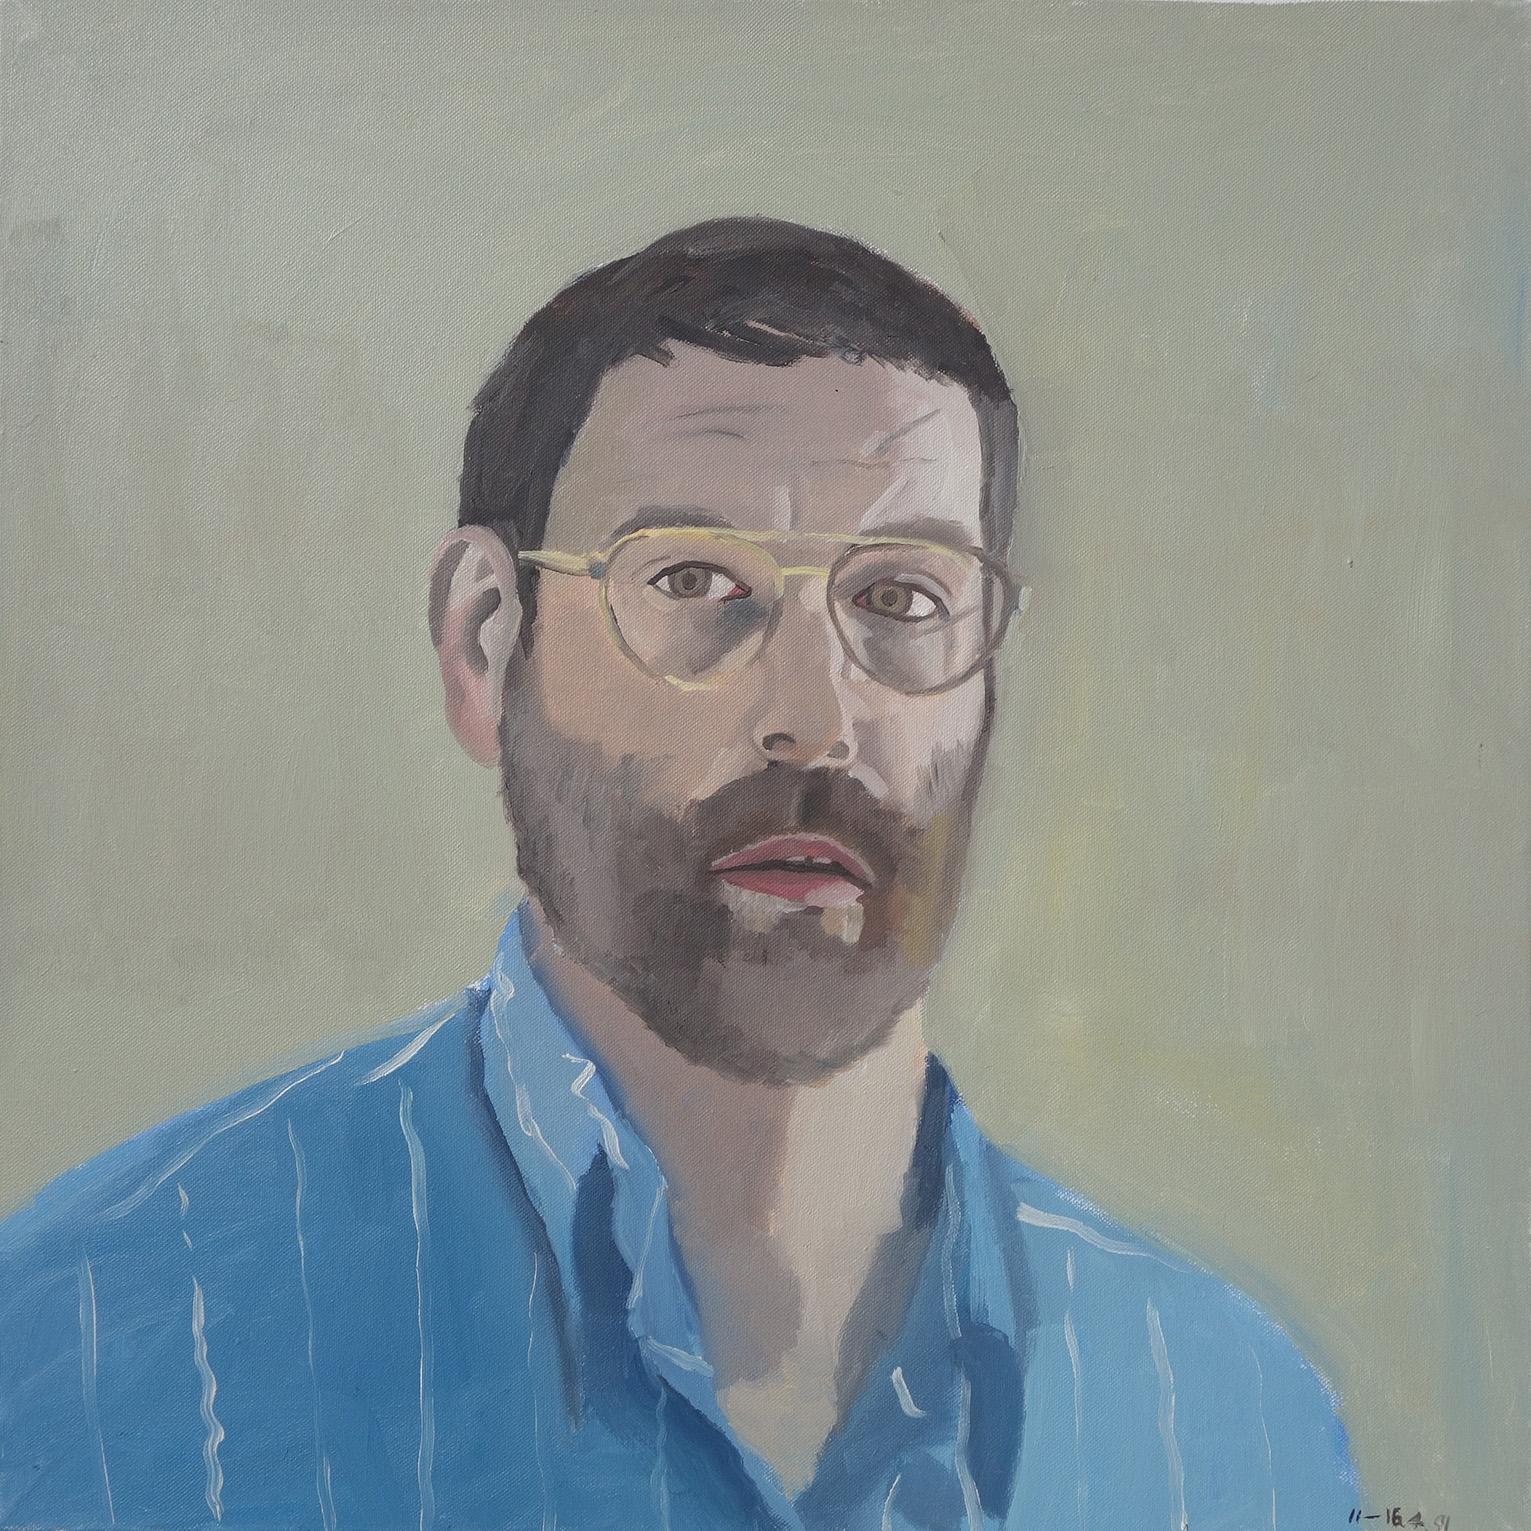 self portrait series 19th july 1991 bryan charnley